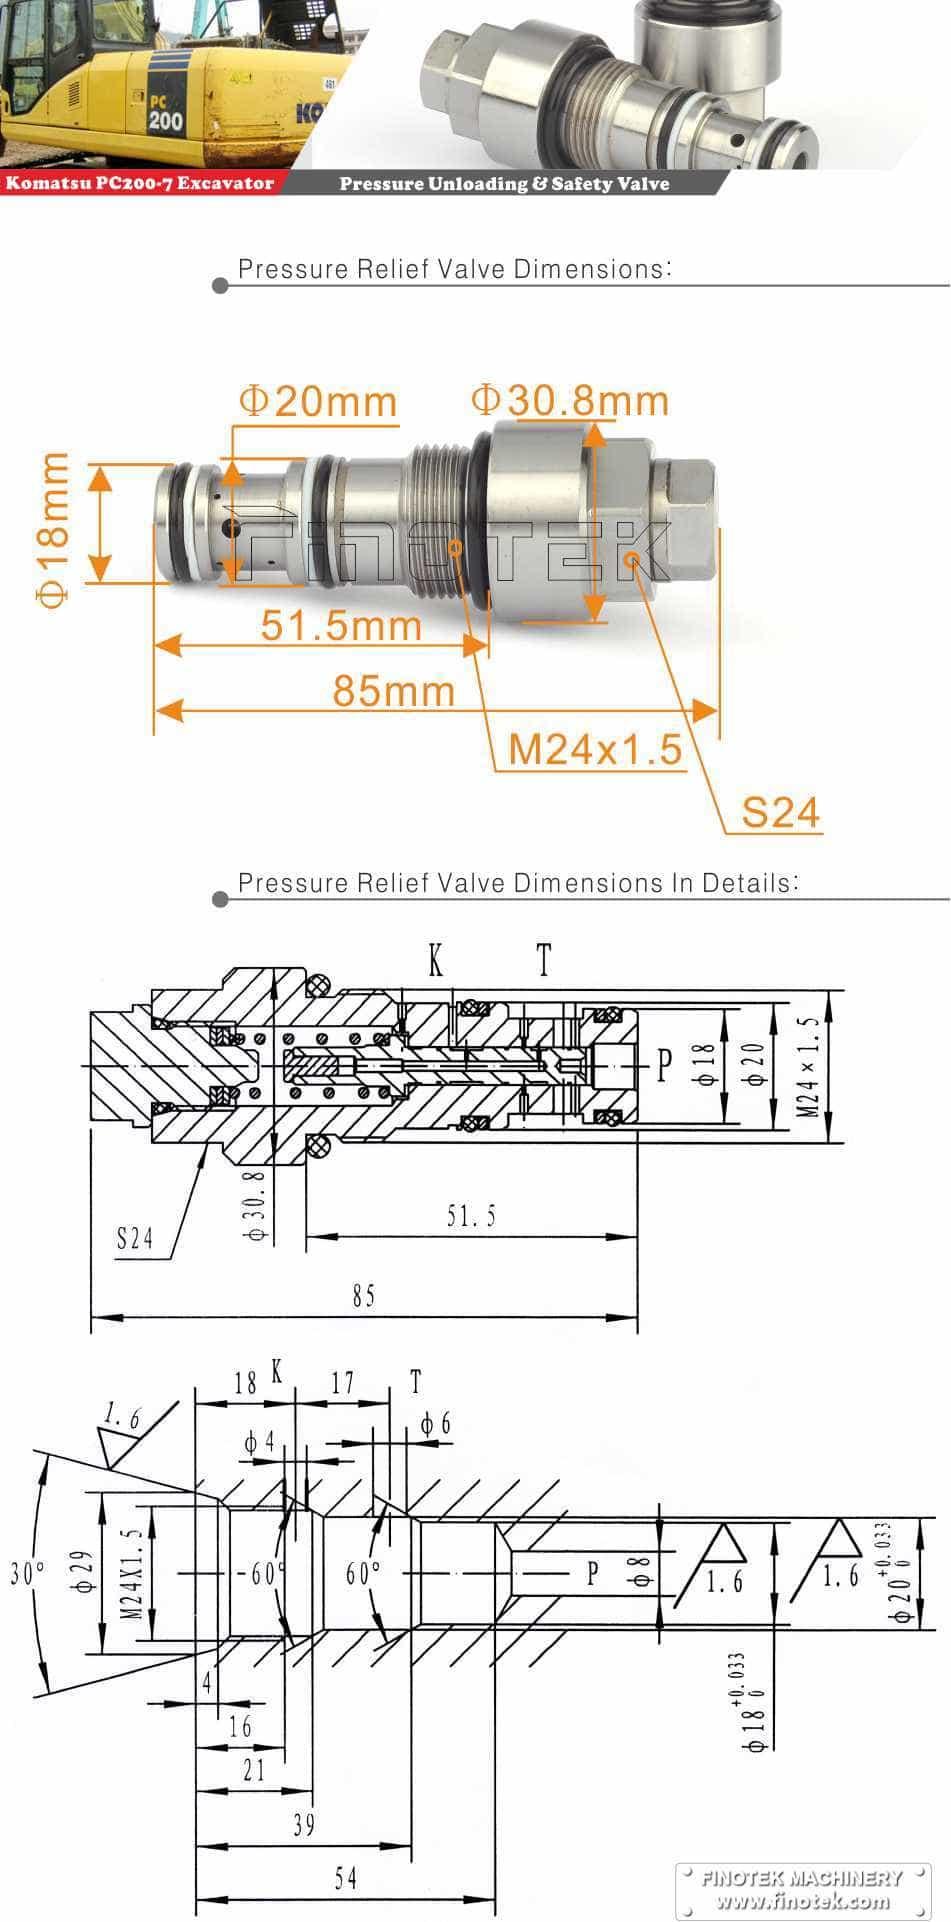 Komatsu PC200-7/8 Excavator Safety Valve, Pressure Safety Valve